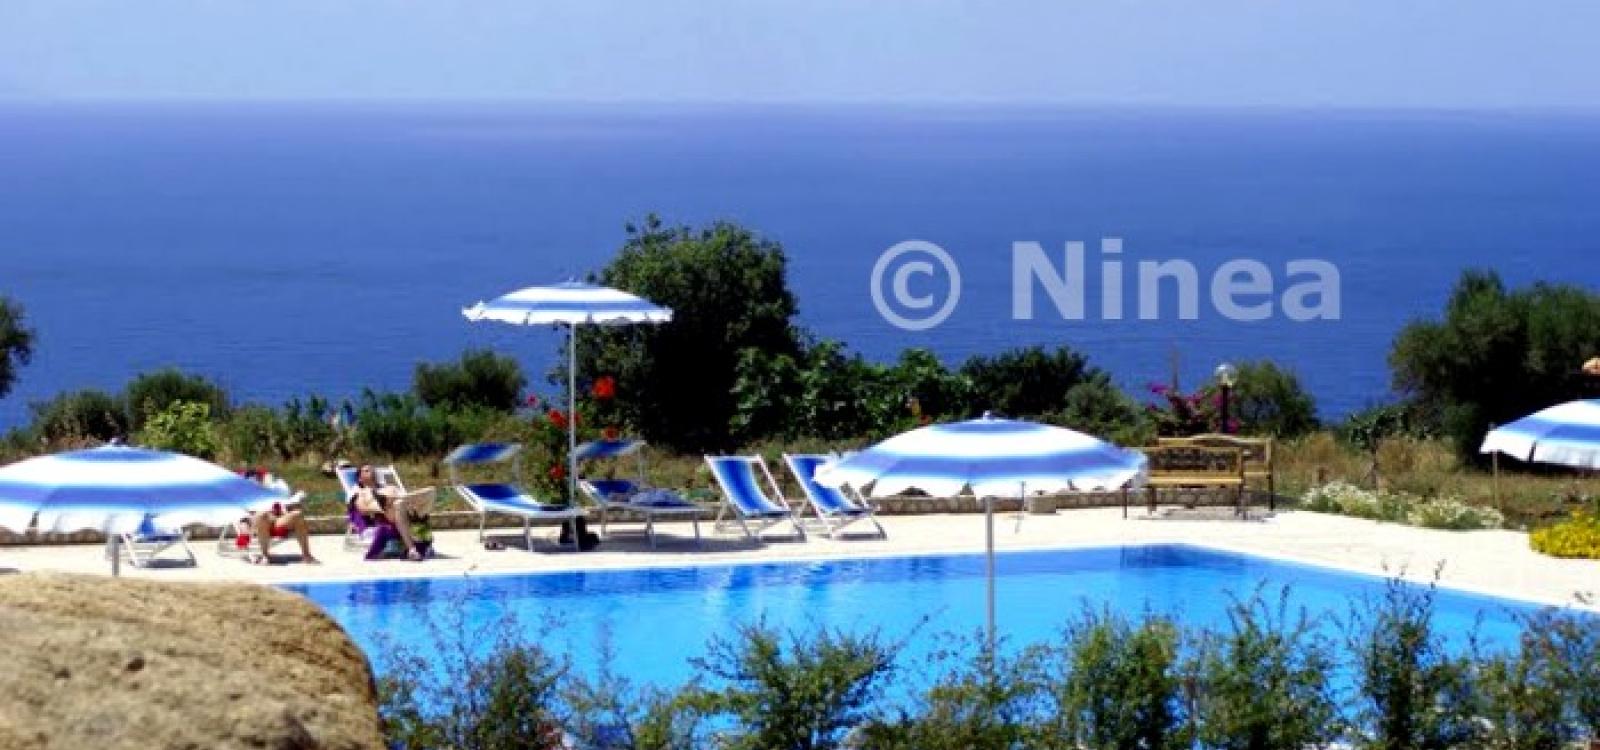 piscina ninea